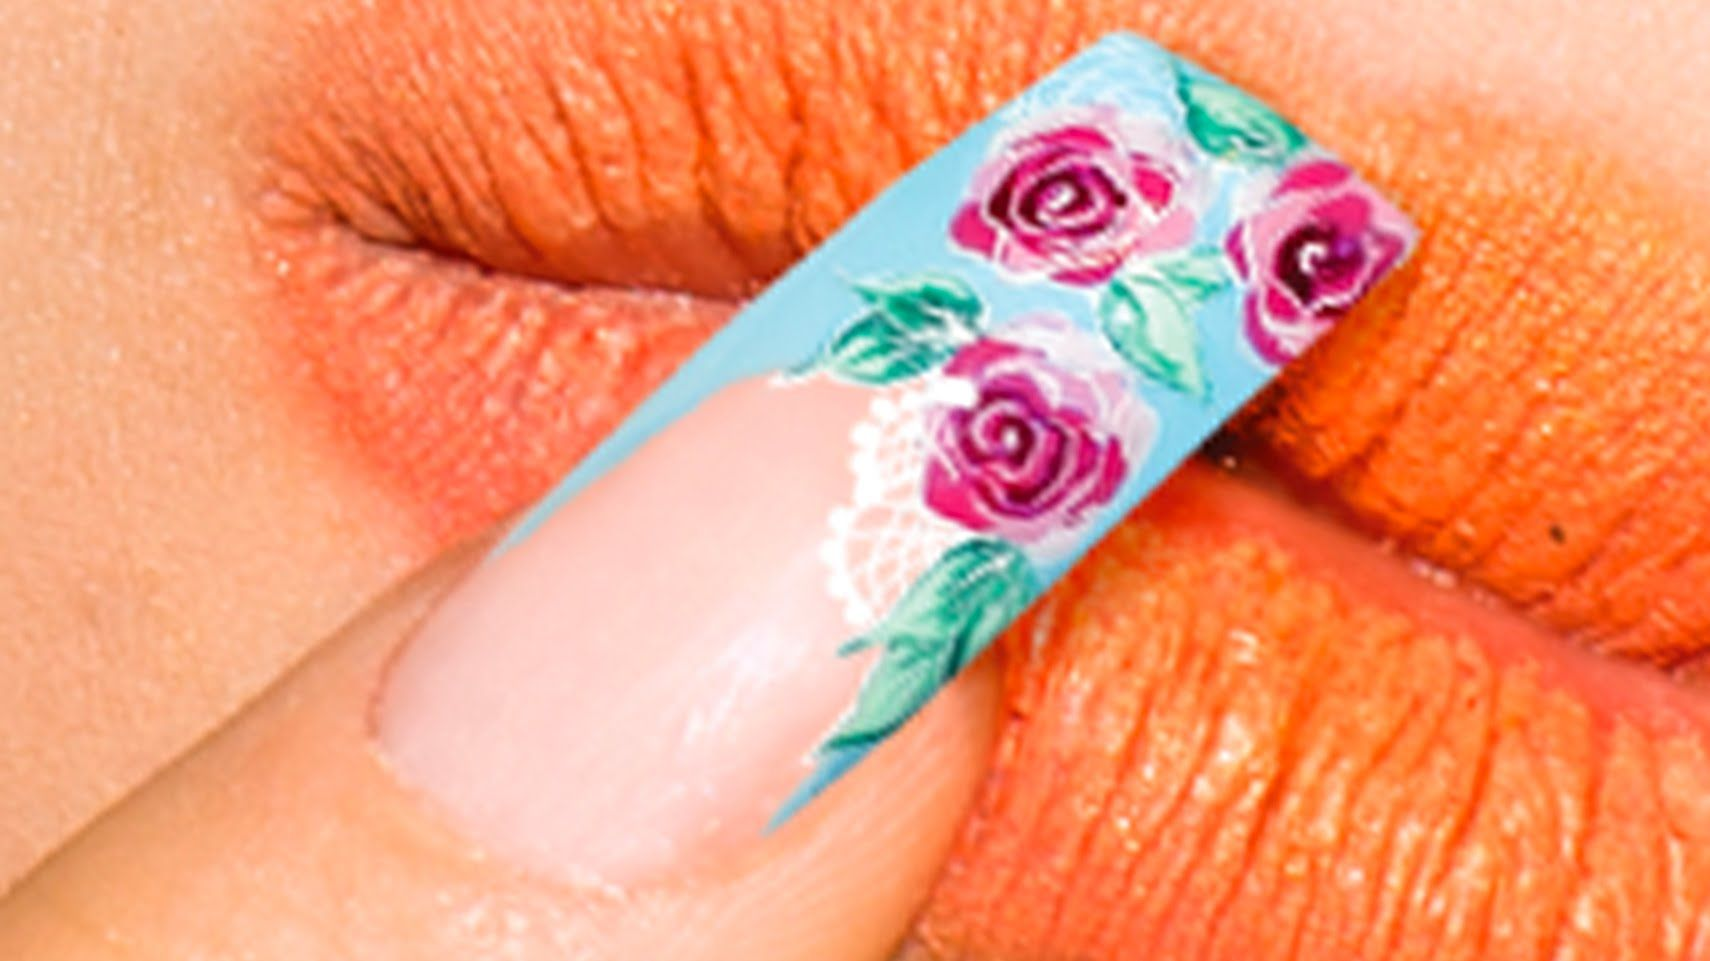 New Old Romantic - Nail Art | Artnails Express Yourself | Pinterest ...